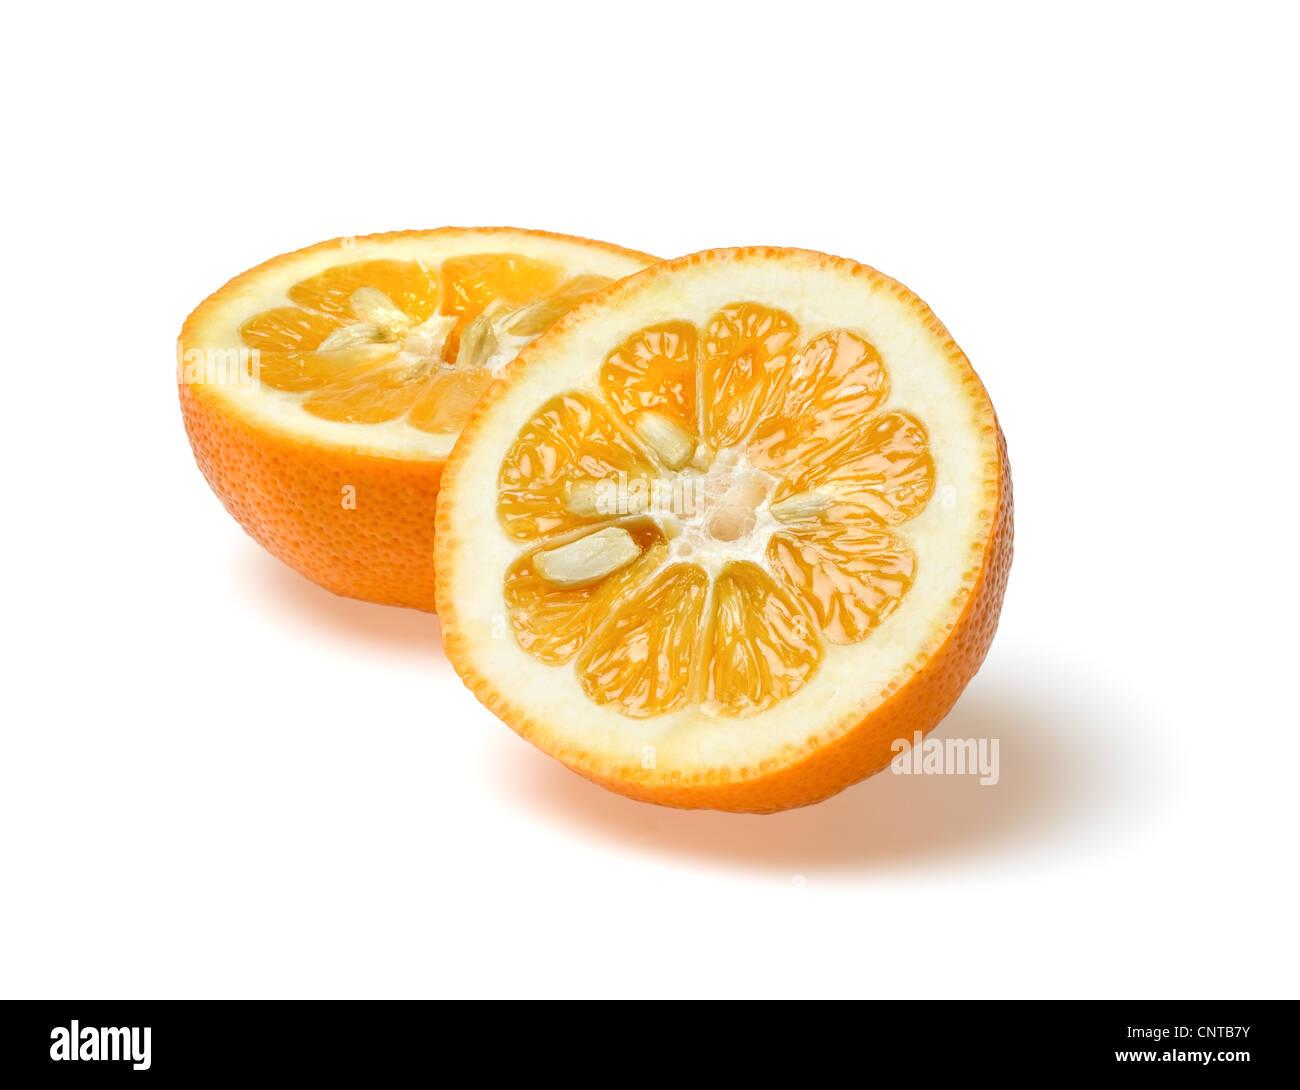 seville oranges - Stock Image